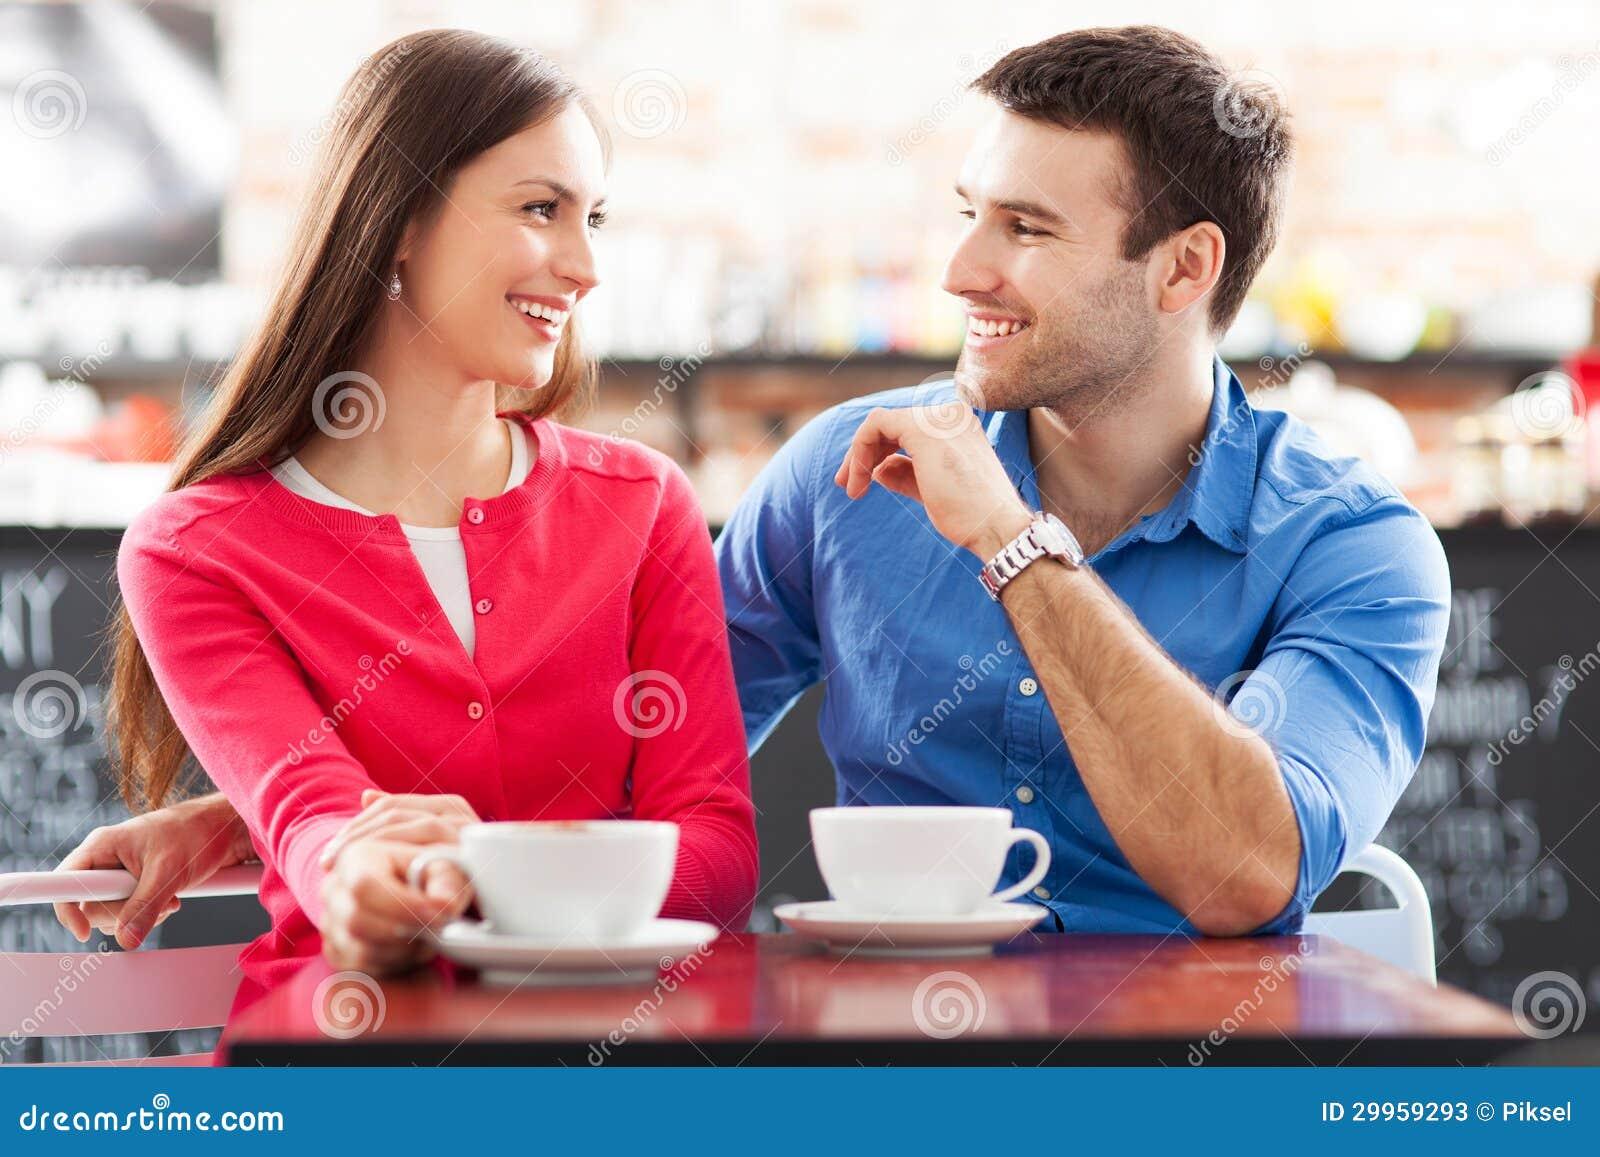 Картинки знакомства в ресторане